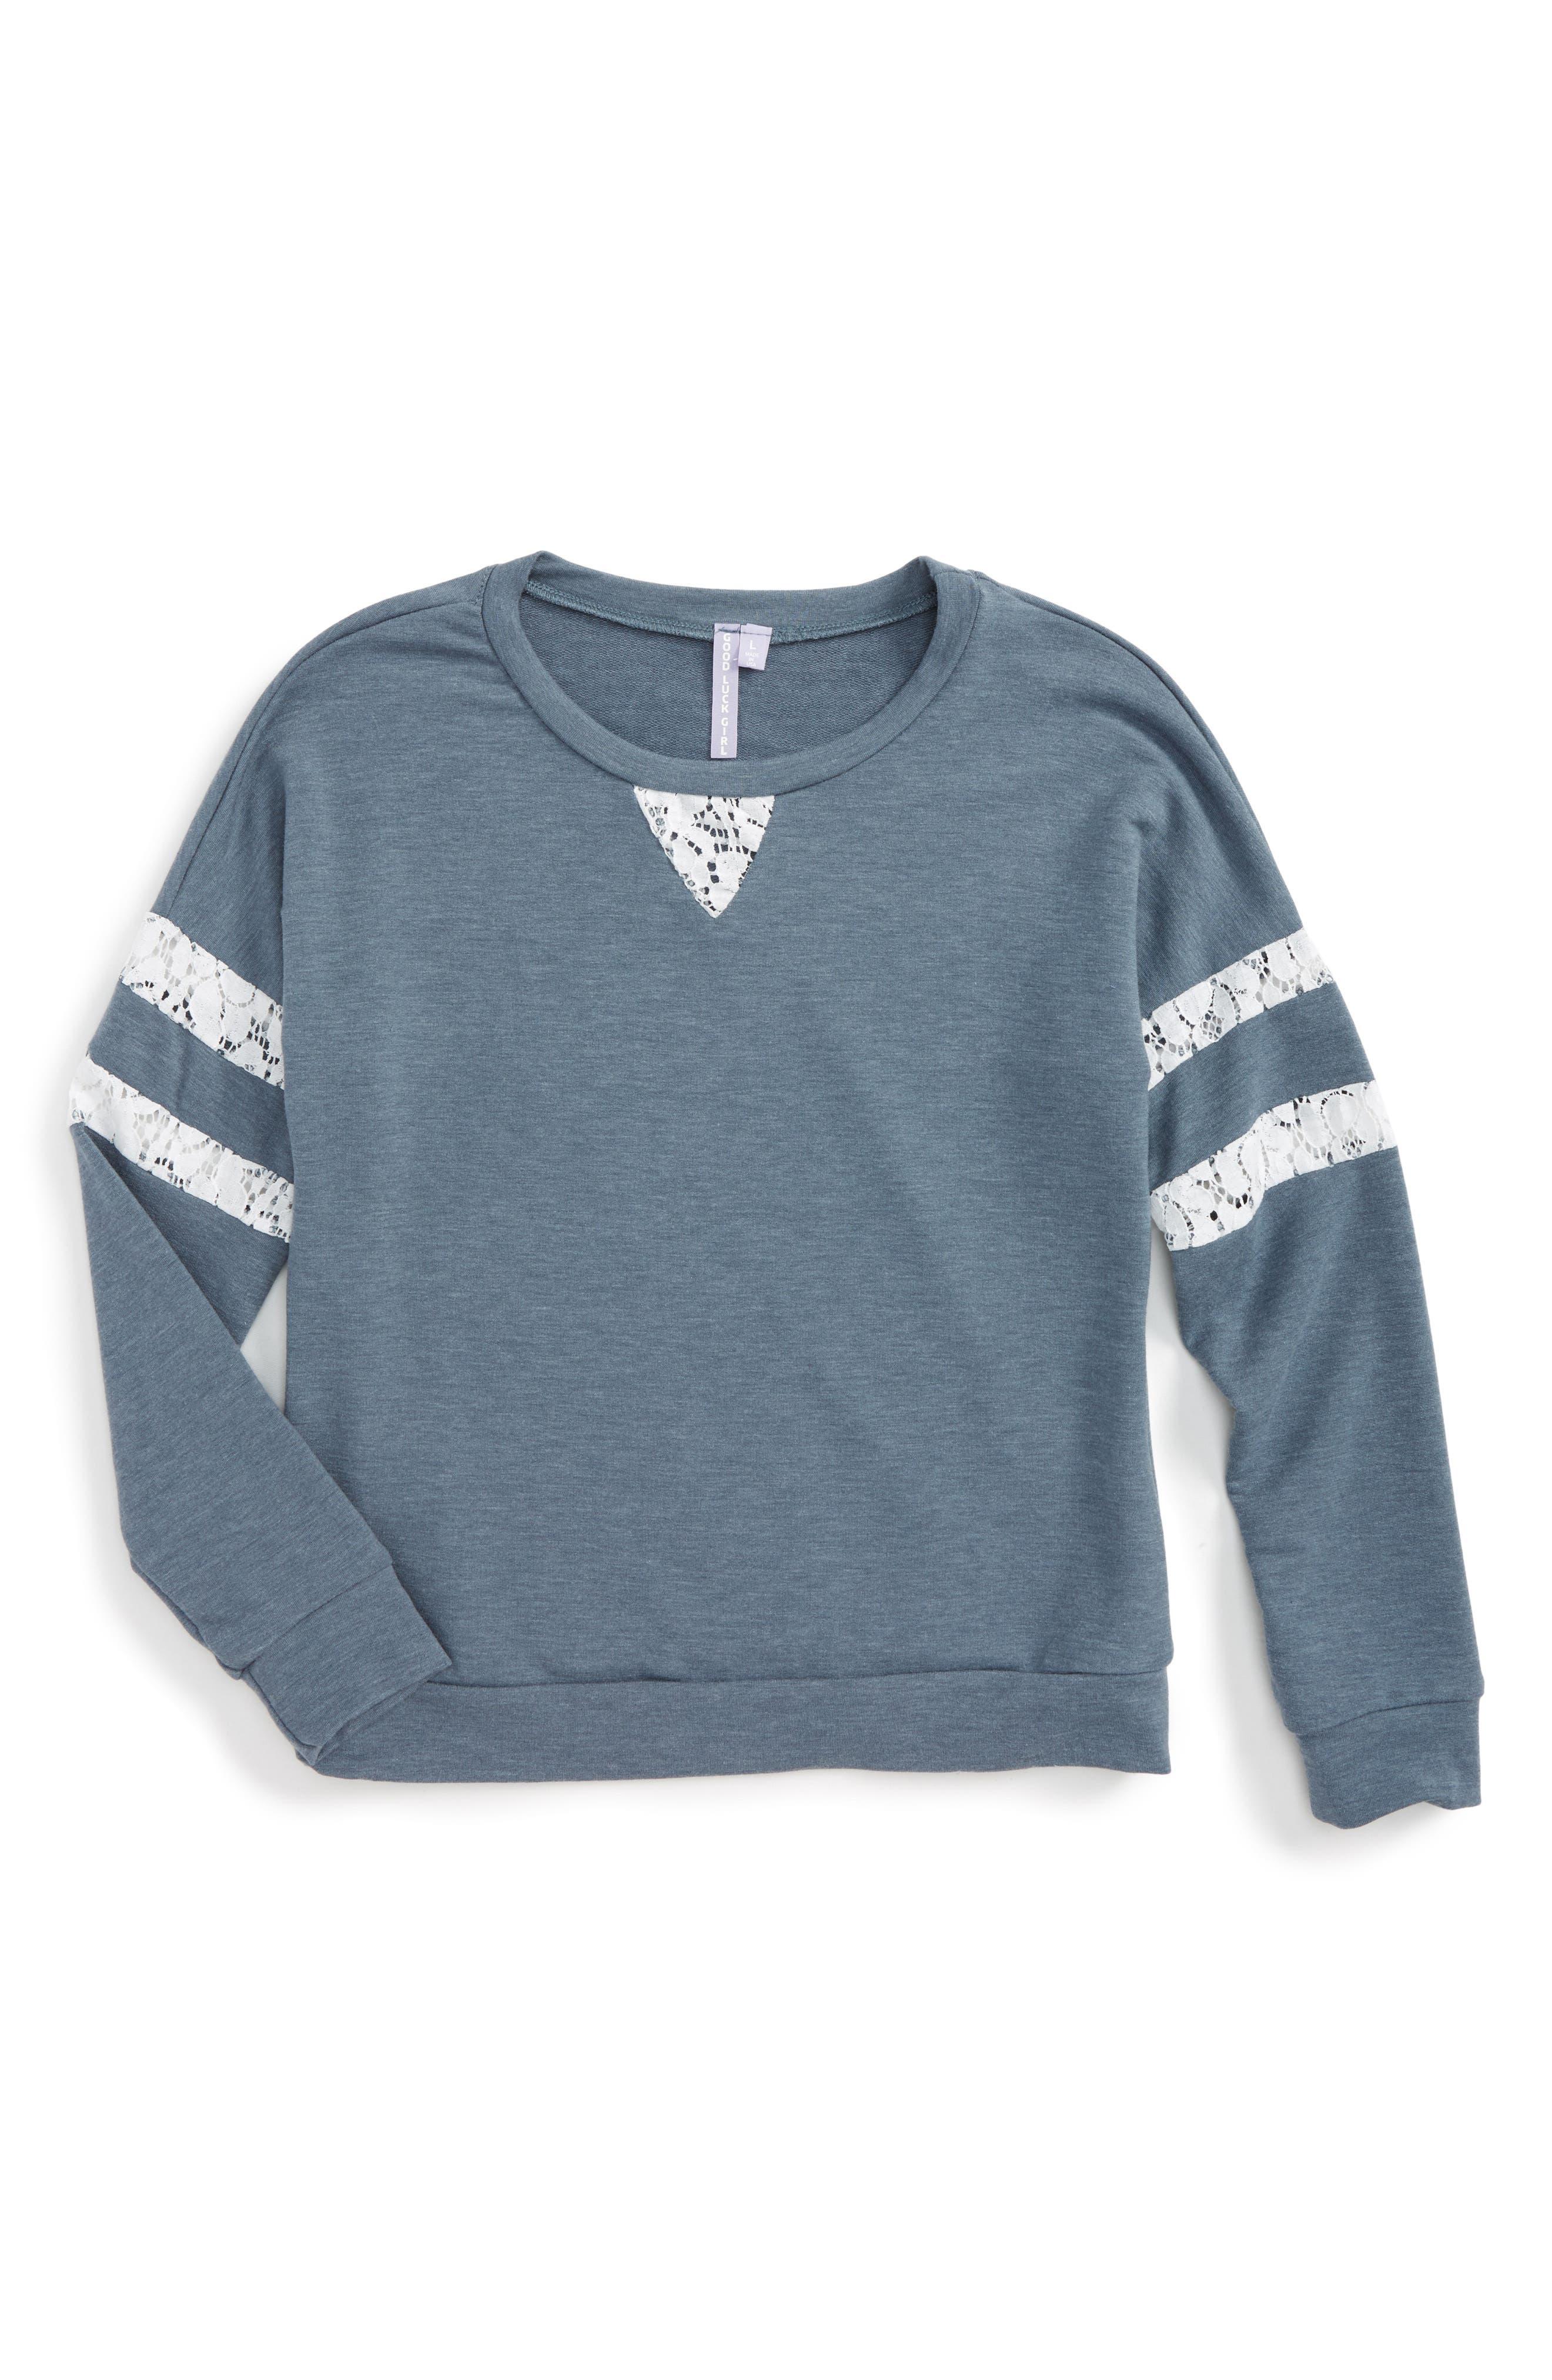 Lace Inset Sweatshirt,                             Main thumbnail 1, color,                             421